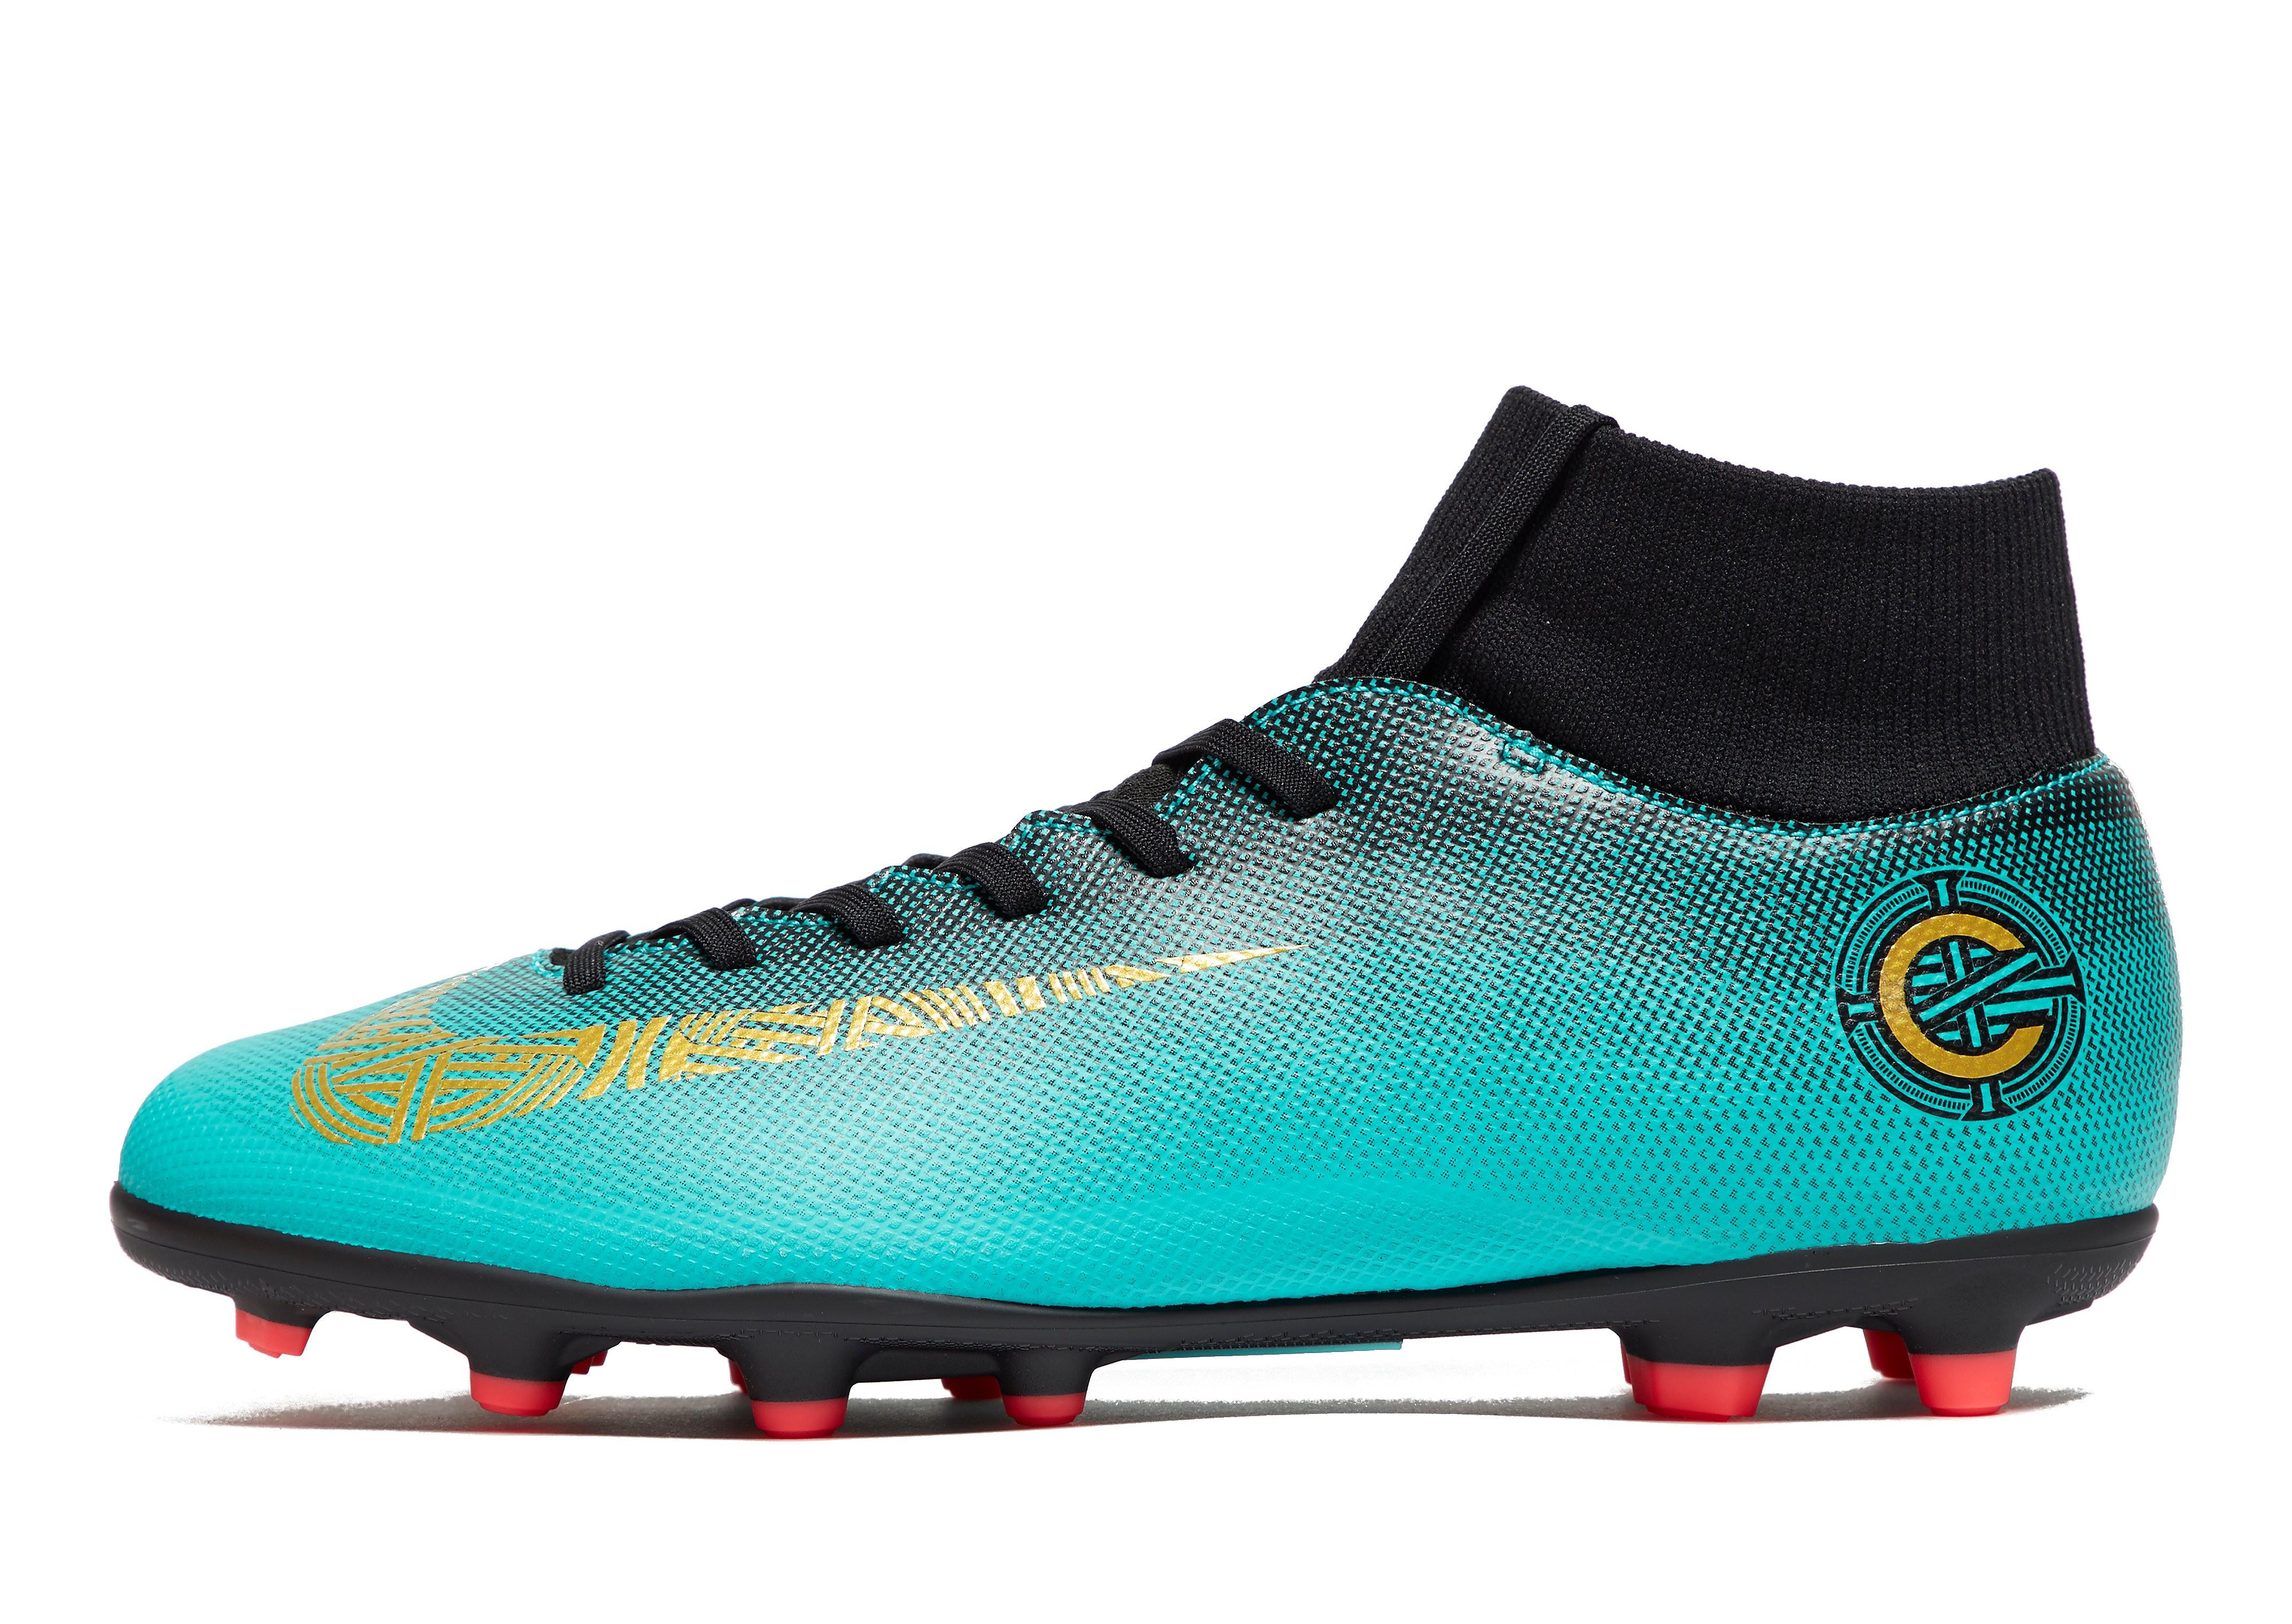 Nike Mercurial Club CR7 Dynamic Fit MG